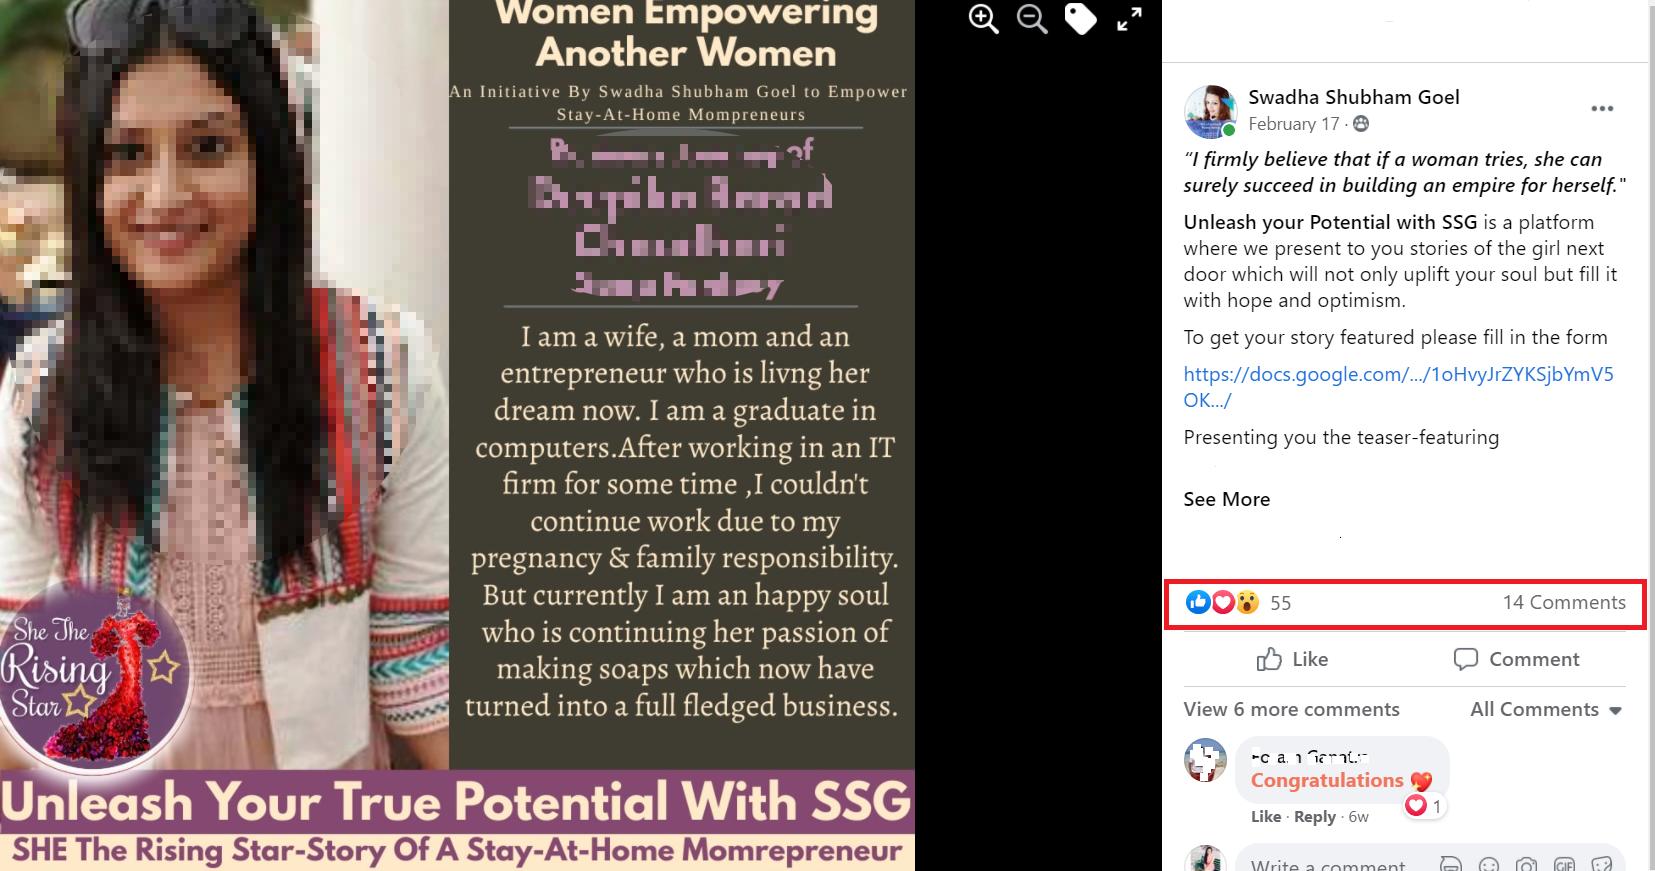 unleash your true potential- Swadha Shubham Goel